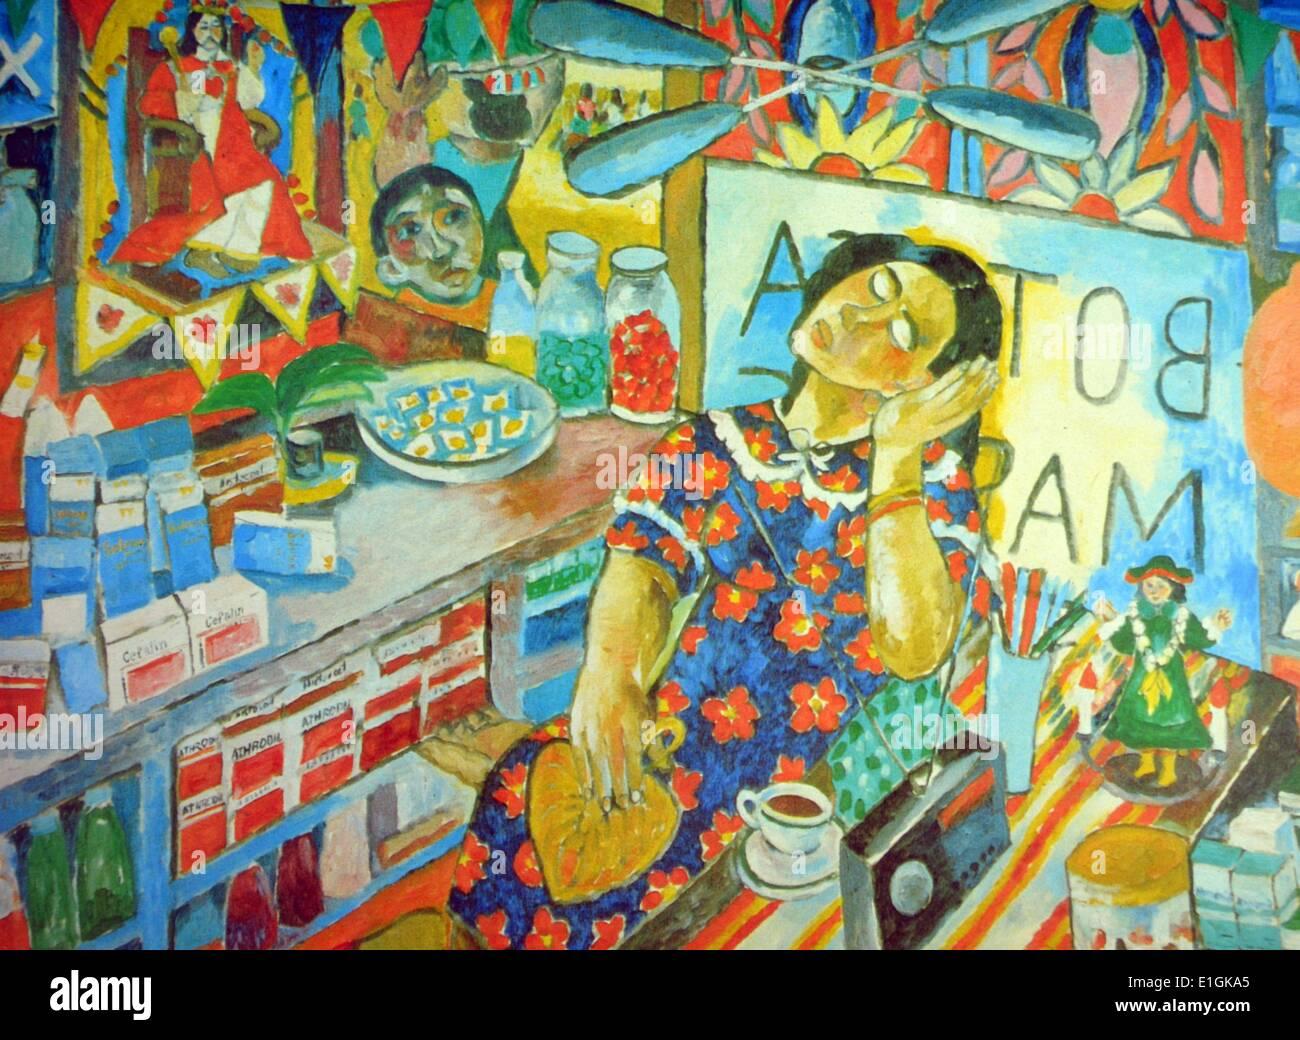 Norma Belleza, 'Botica' 1985, oil on canvas - Stock Image